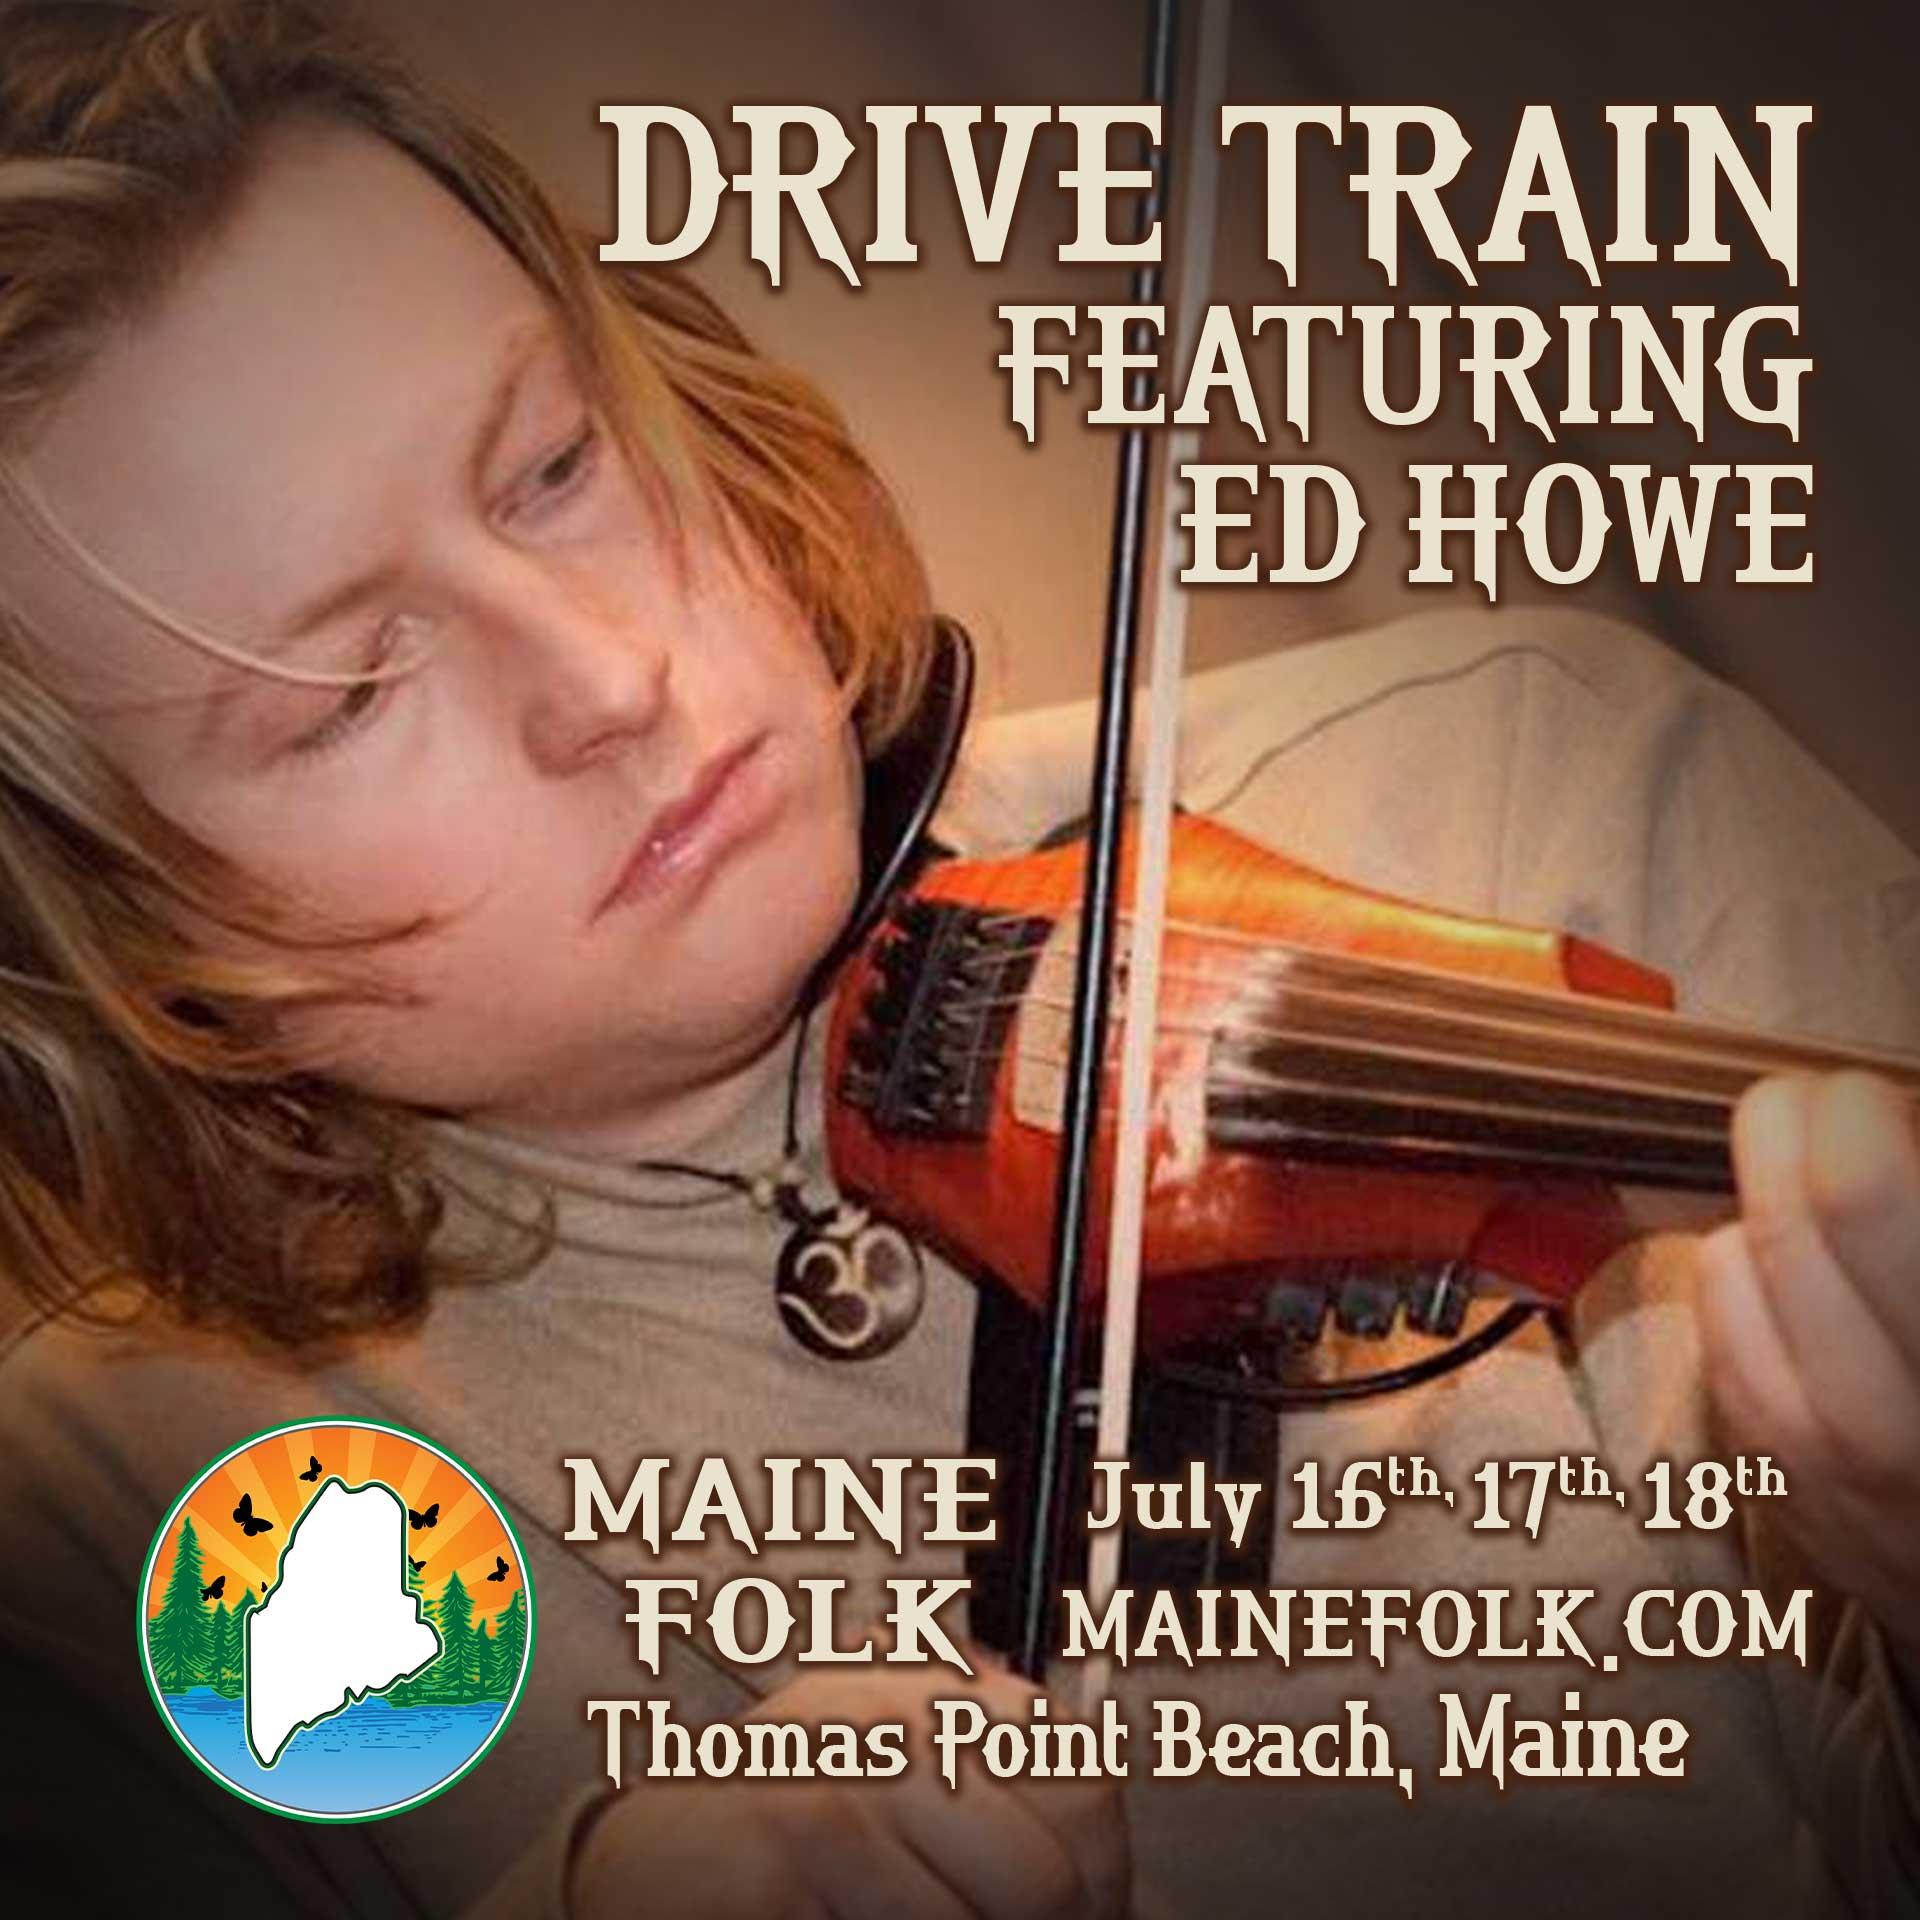 Drive Train, Ed Howe